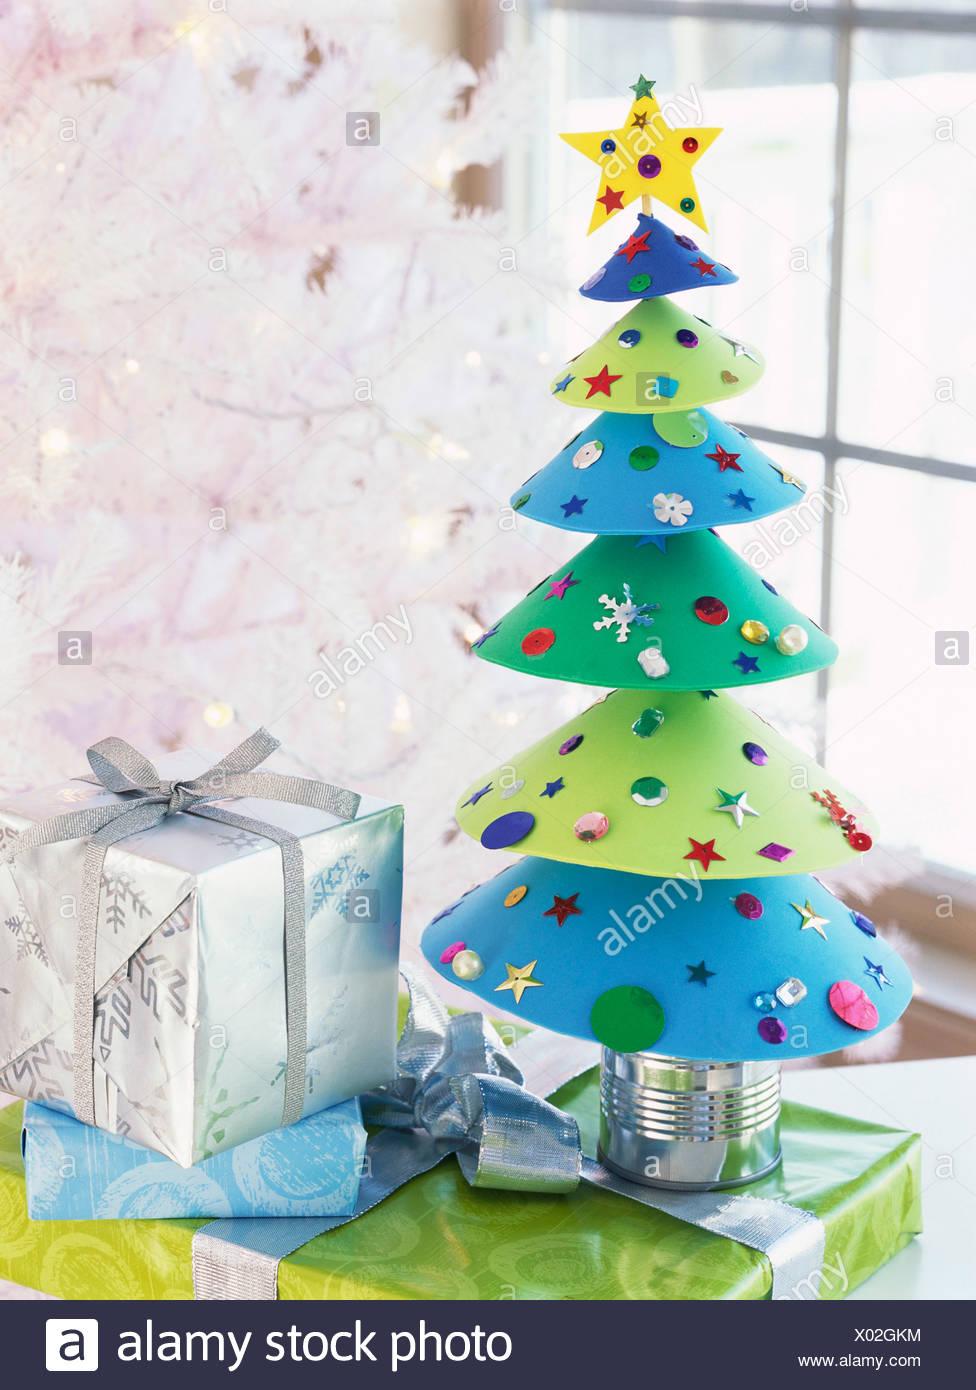 Home-made Christmas tree and gifts Stock Photo: 275422888 - Alamy